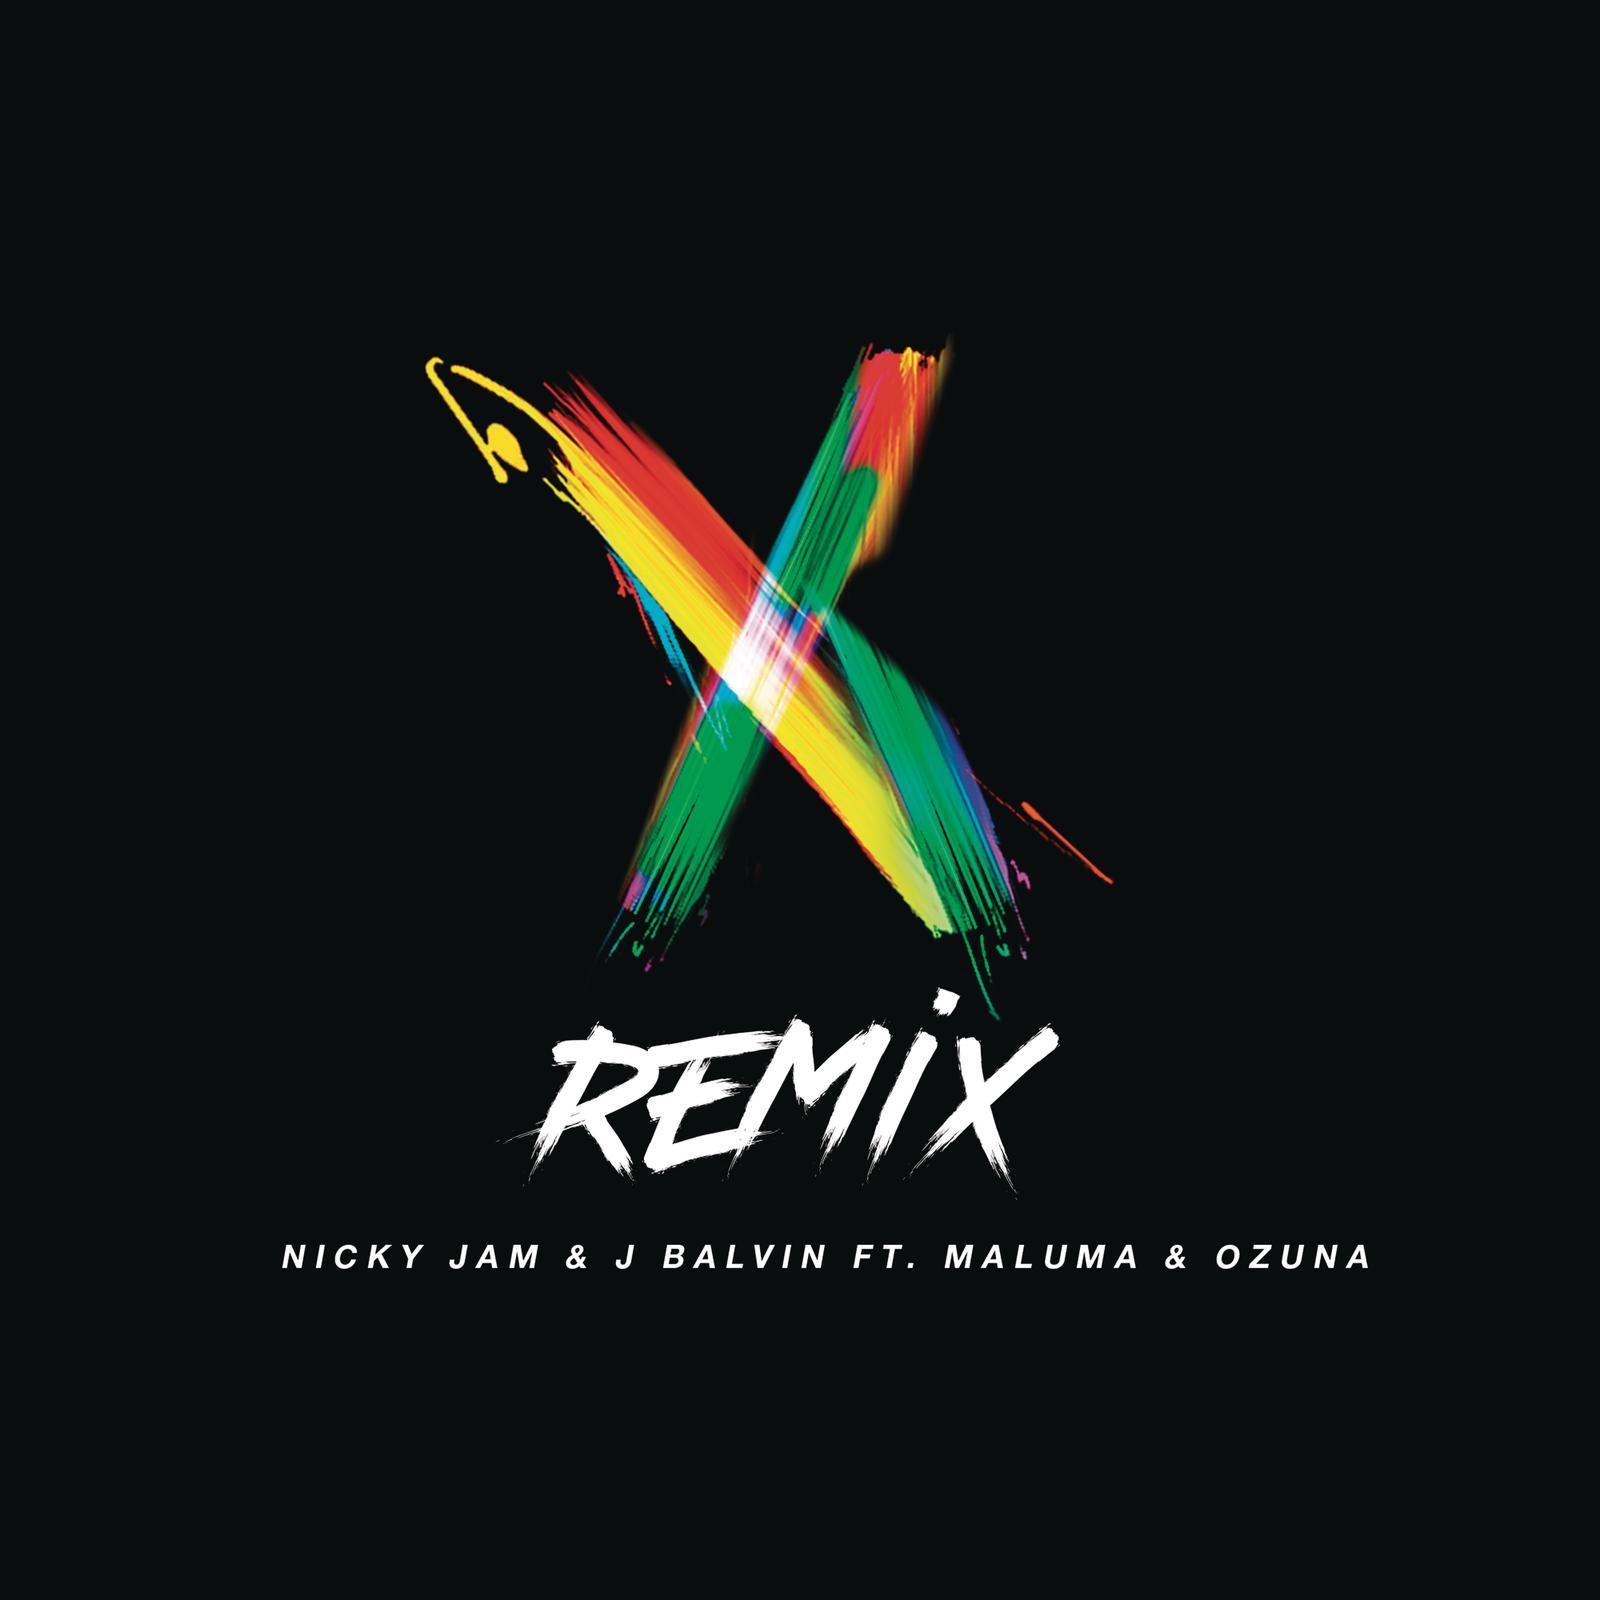 NickyJam_XRemix_Cover